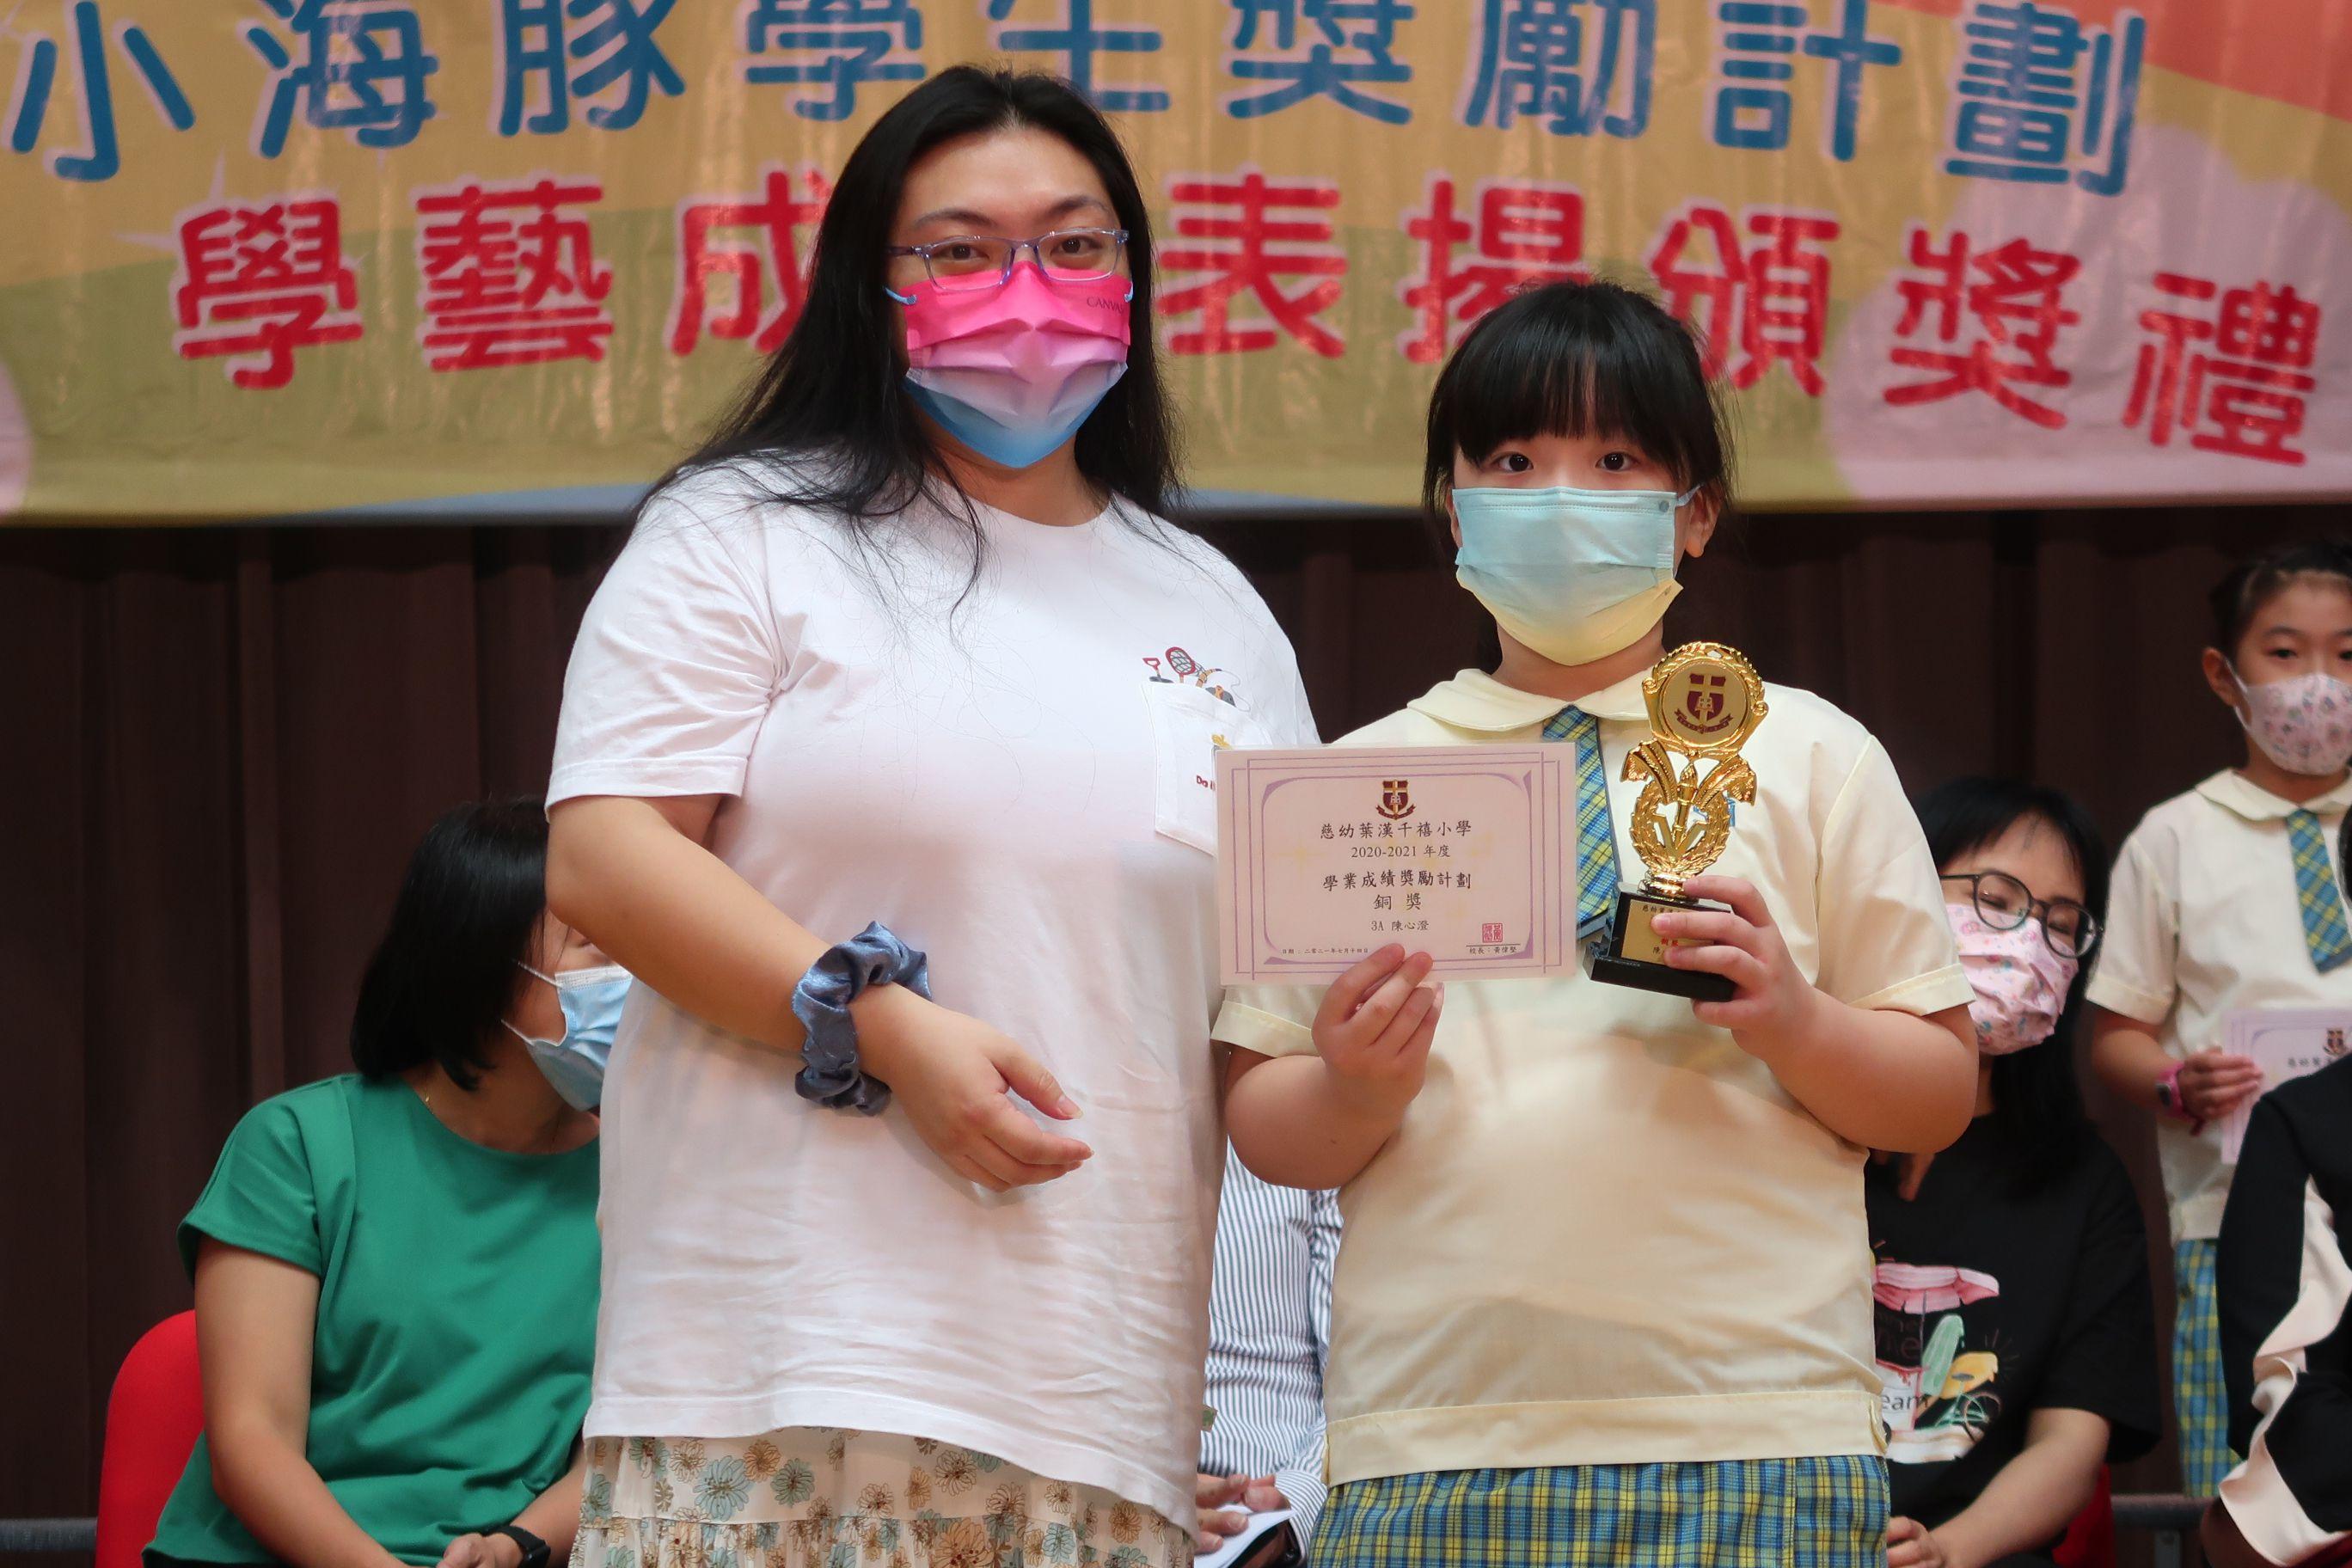 https://syh.edu.hk/sites/default/files/img_5571.jpg